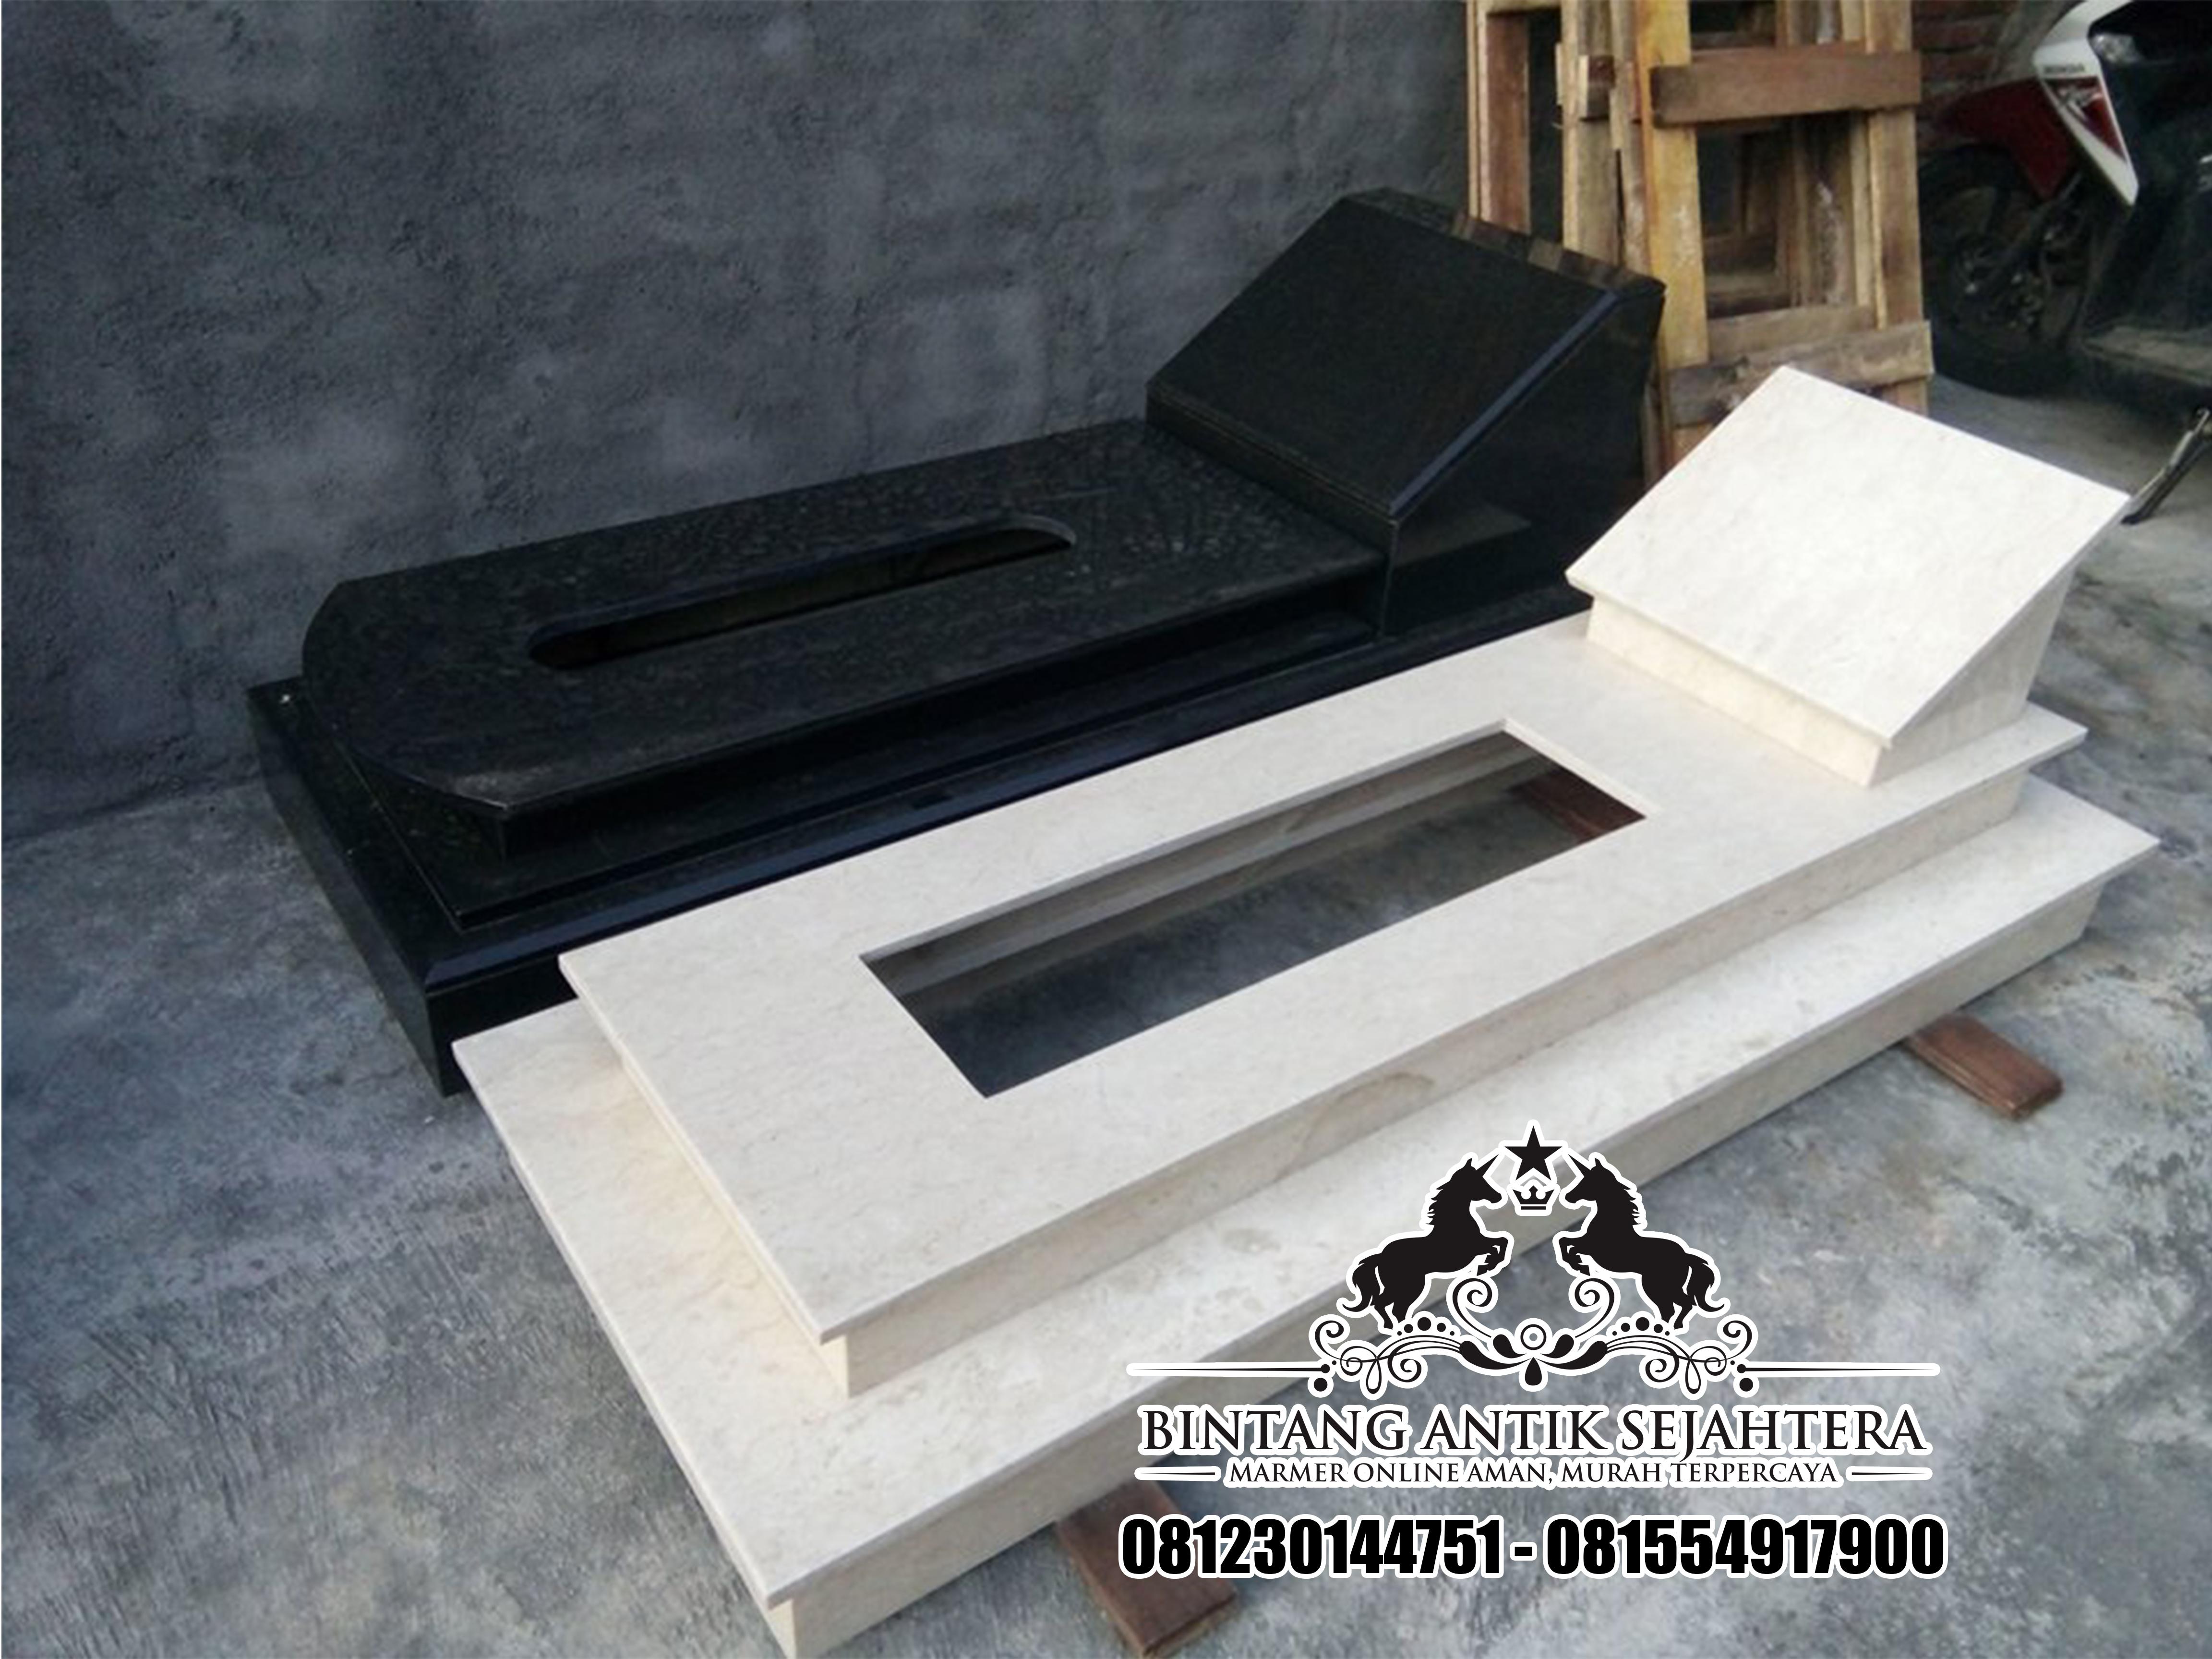 Kijing Marmer Tulungagung, Makam Marmer Murah